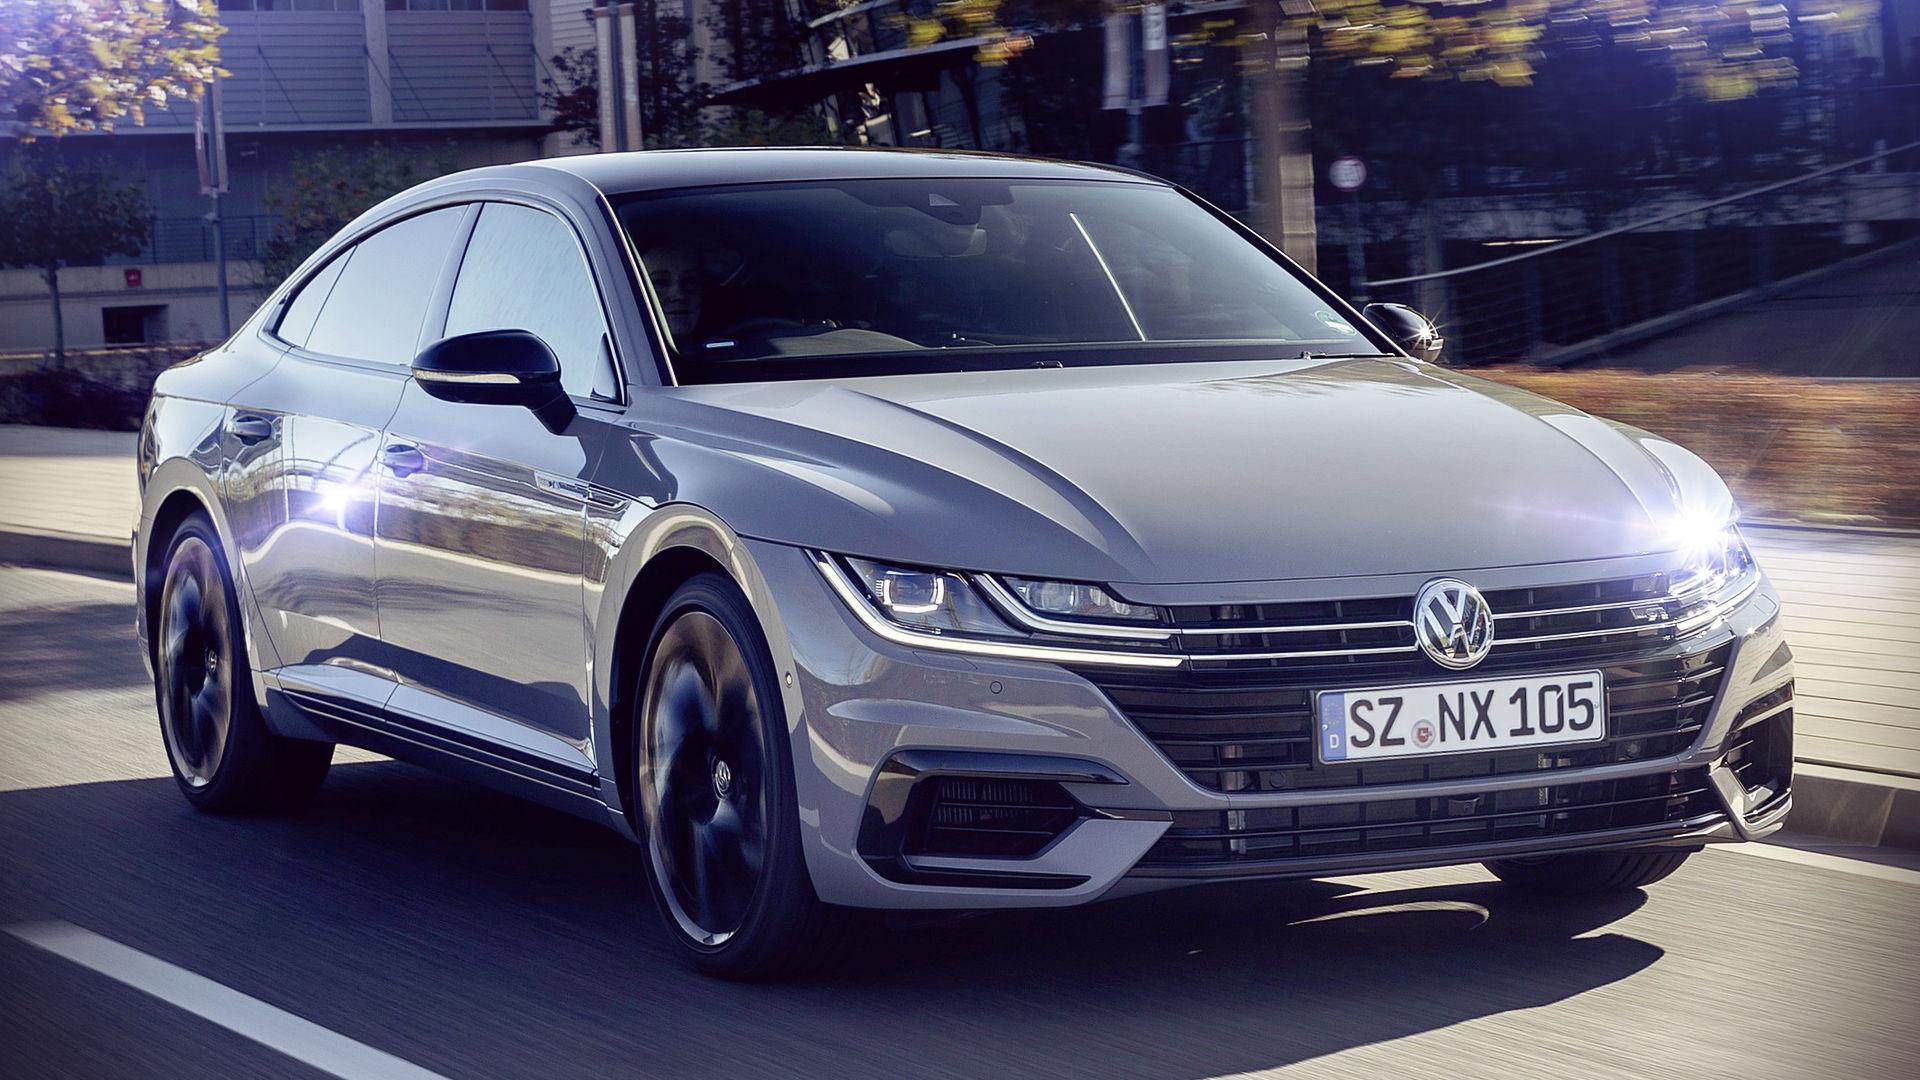 Volkswagen Arteon R Line Edition 2020